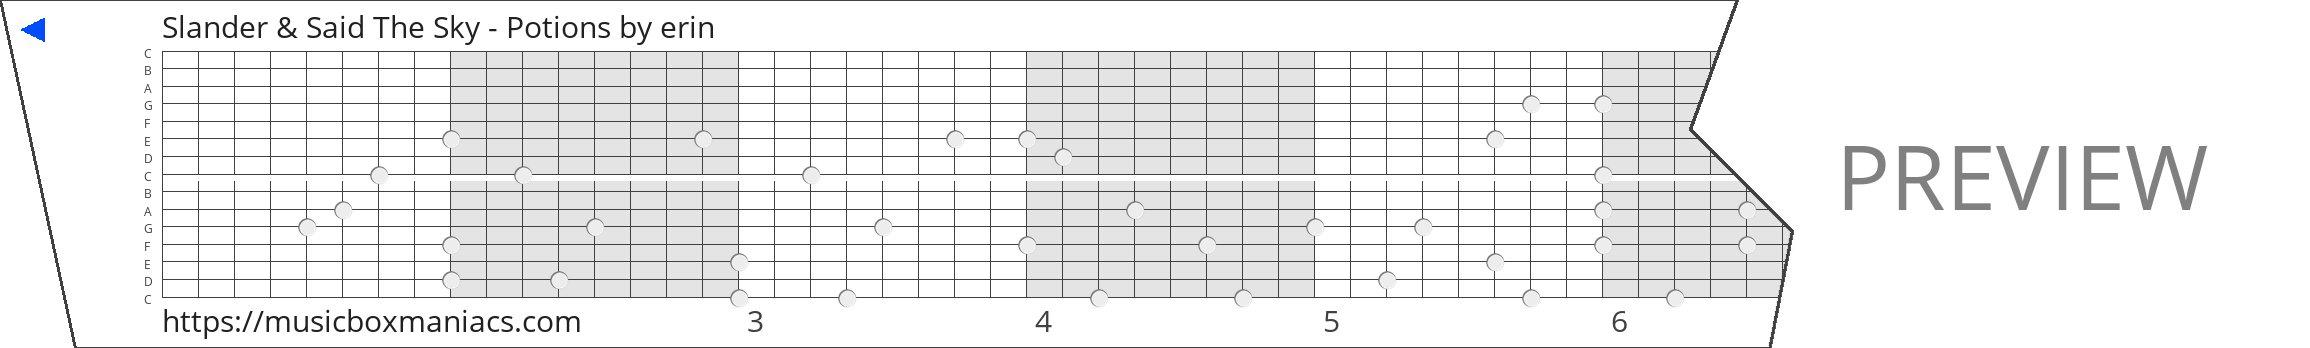 Slander & Said The Sky - Potions 15 note music box paper strip